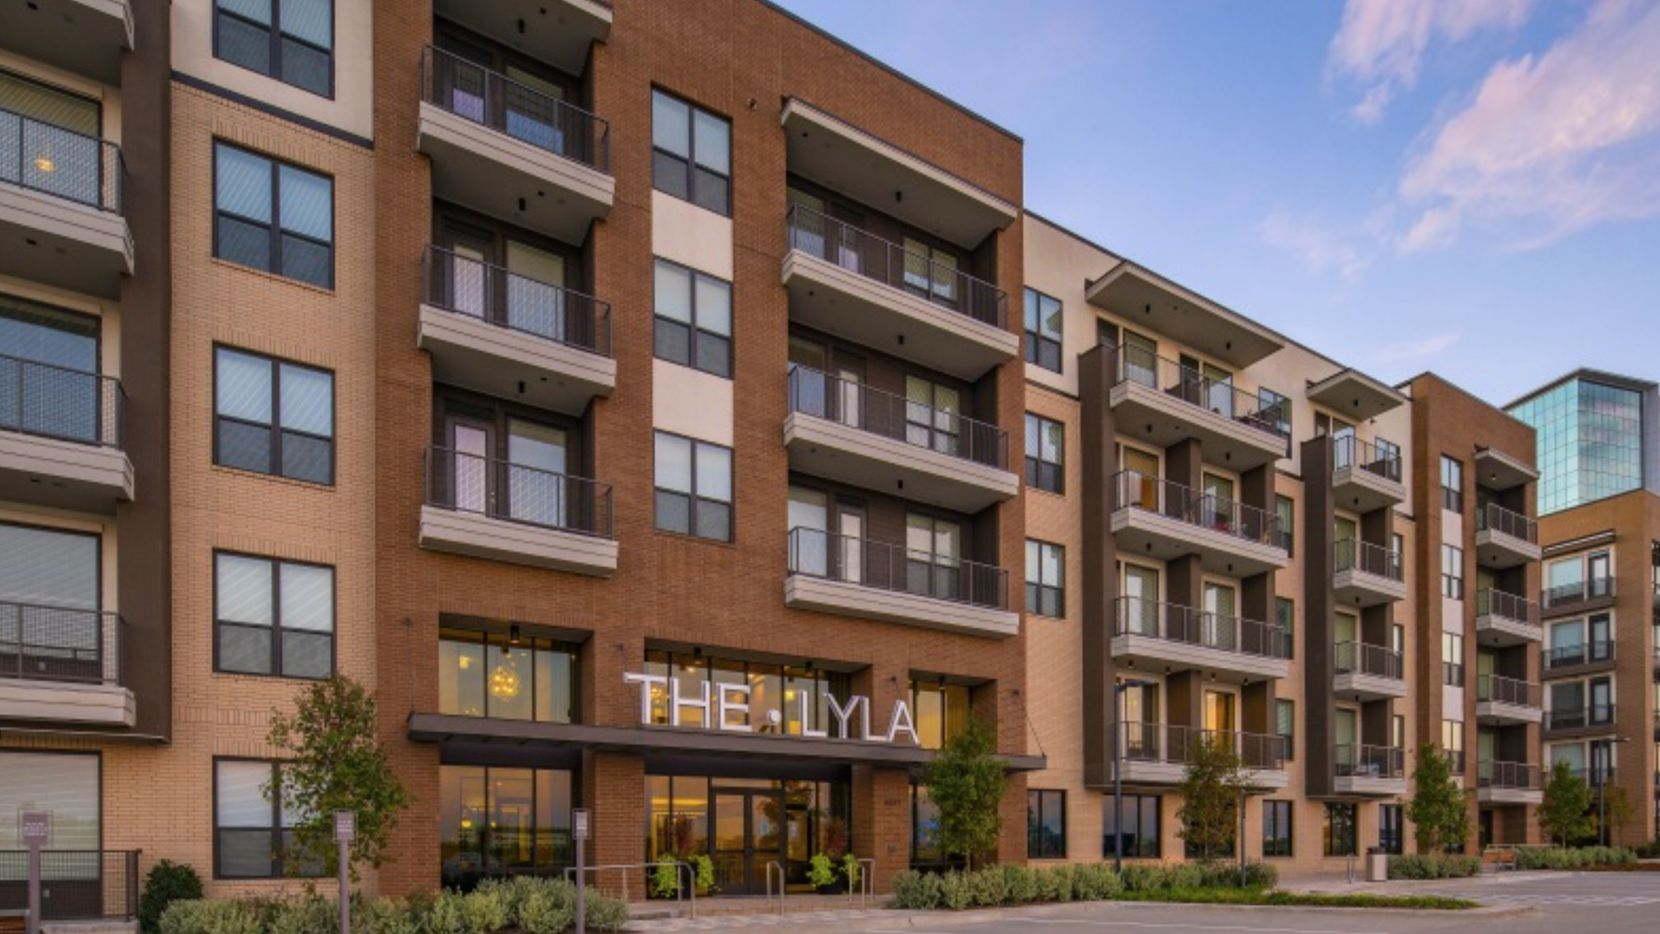 Dallas developer JLB Residential built the Lyla apartments in Richardson.